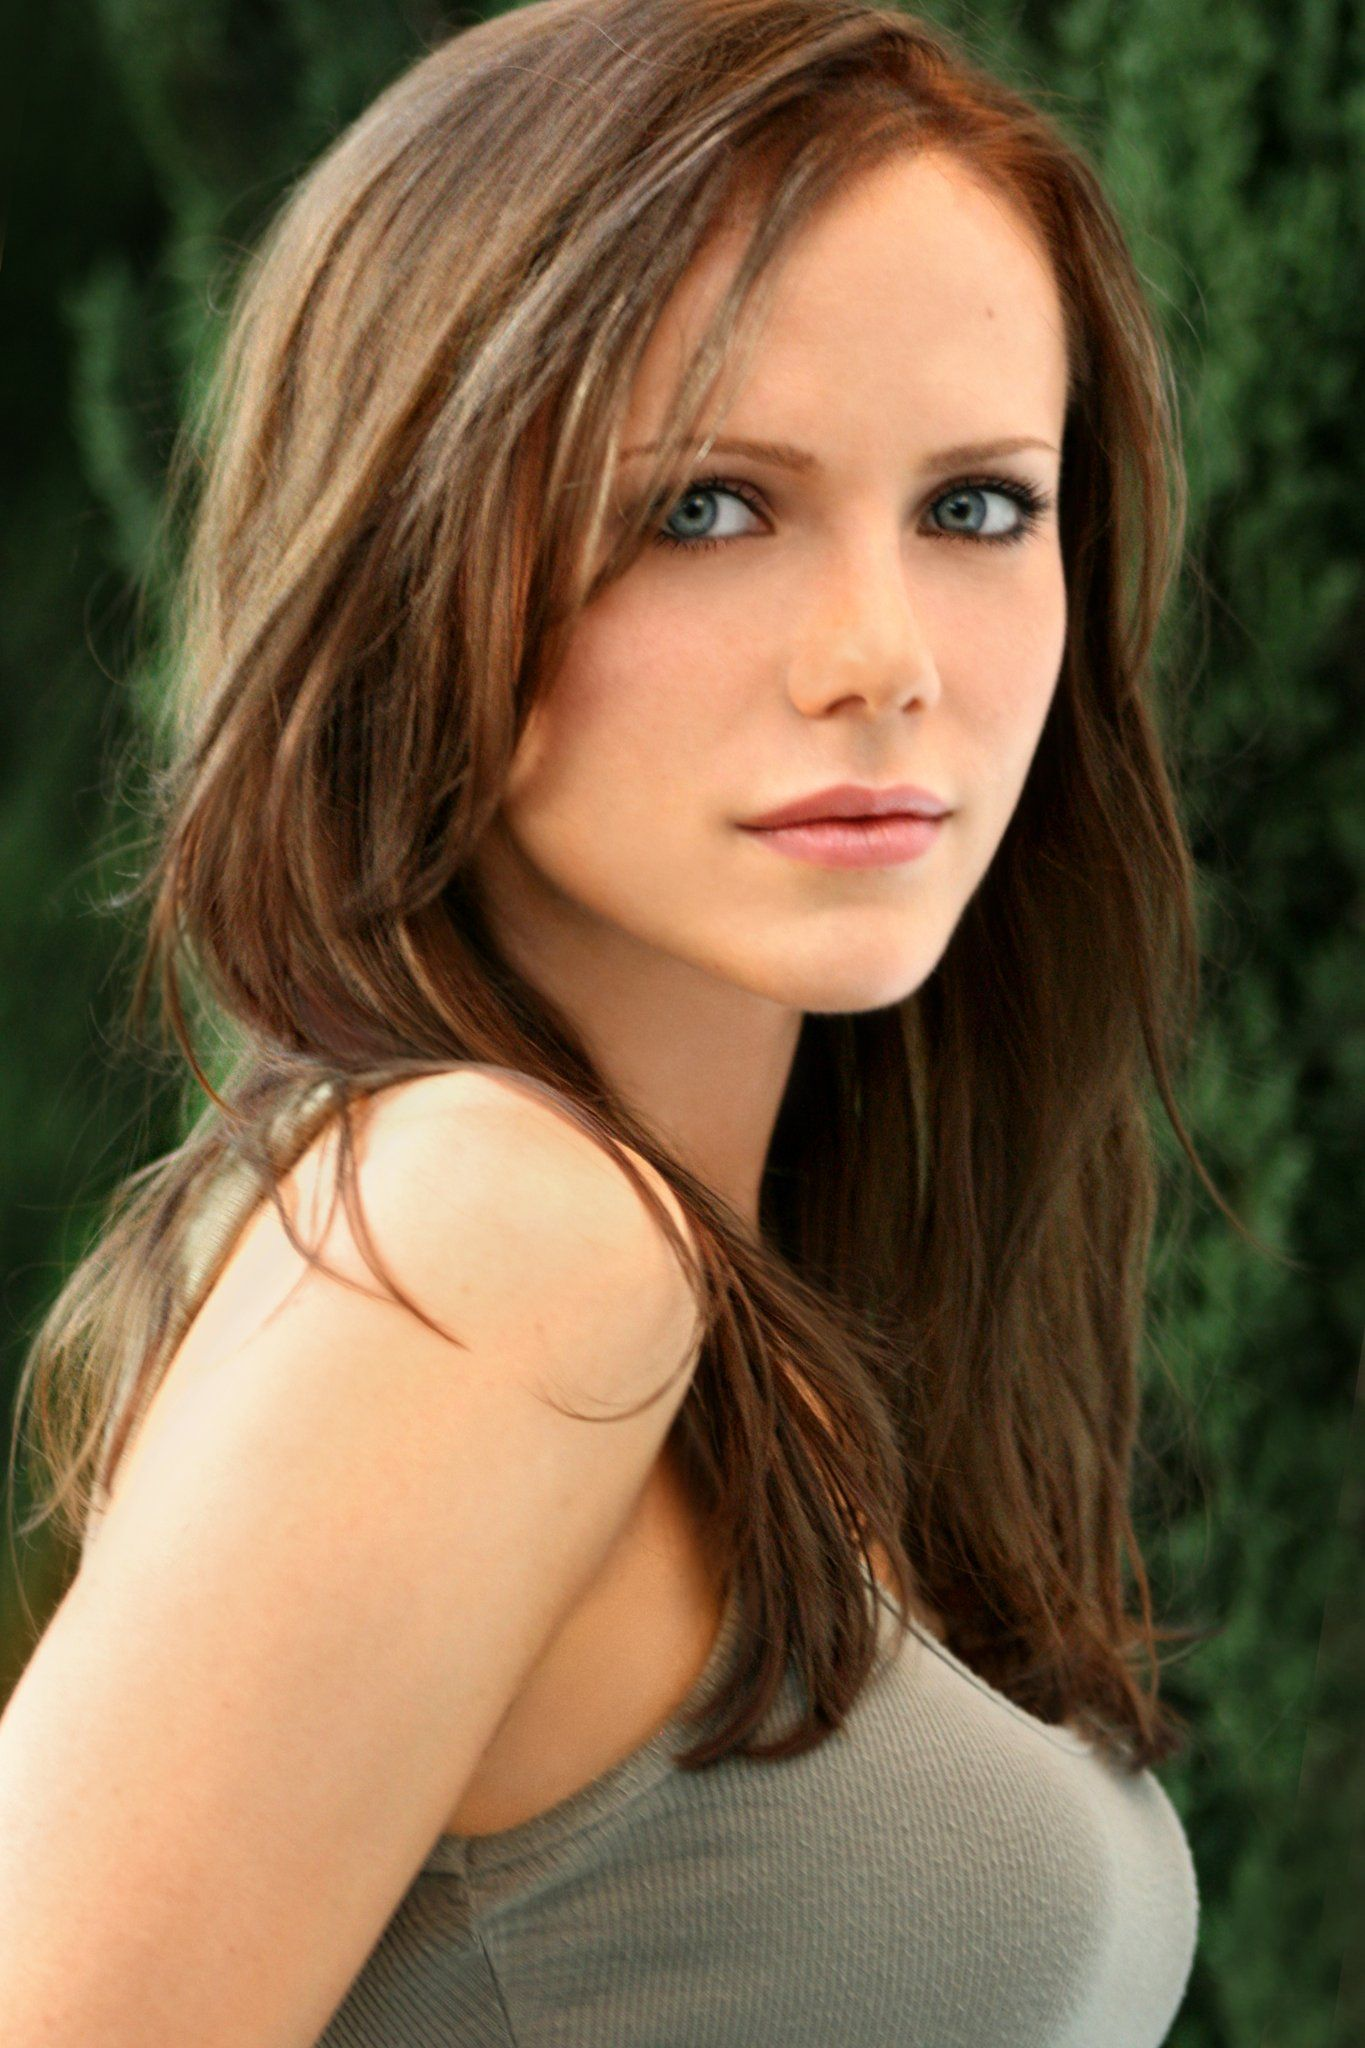 Tanja Reichert | Rostro hermosos, Actrices, Rostros